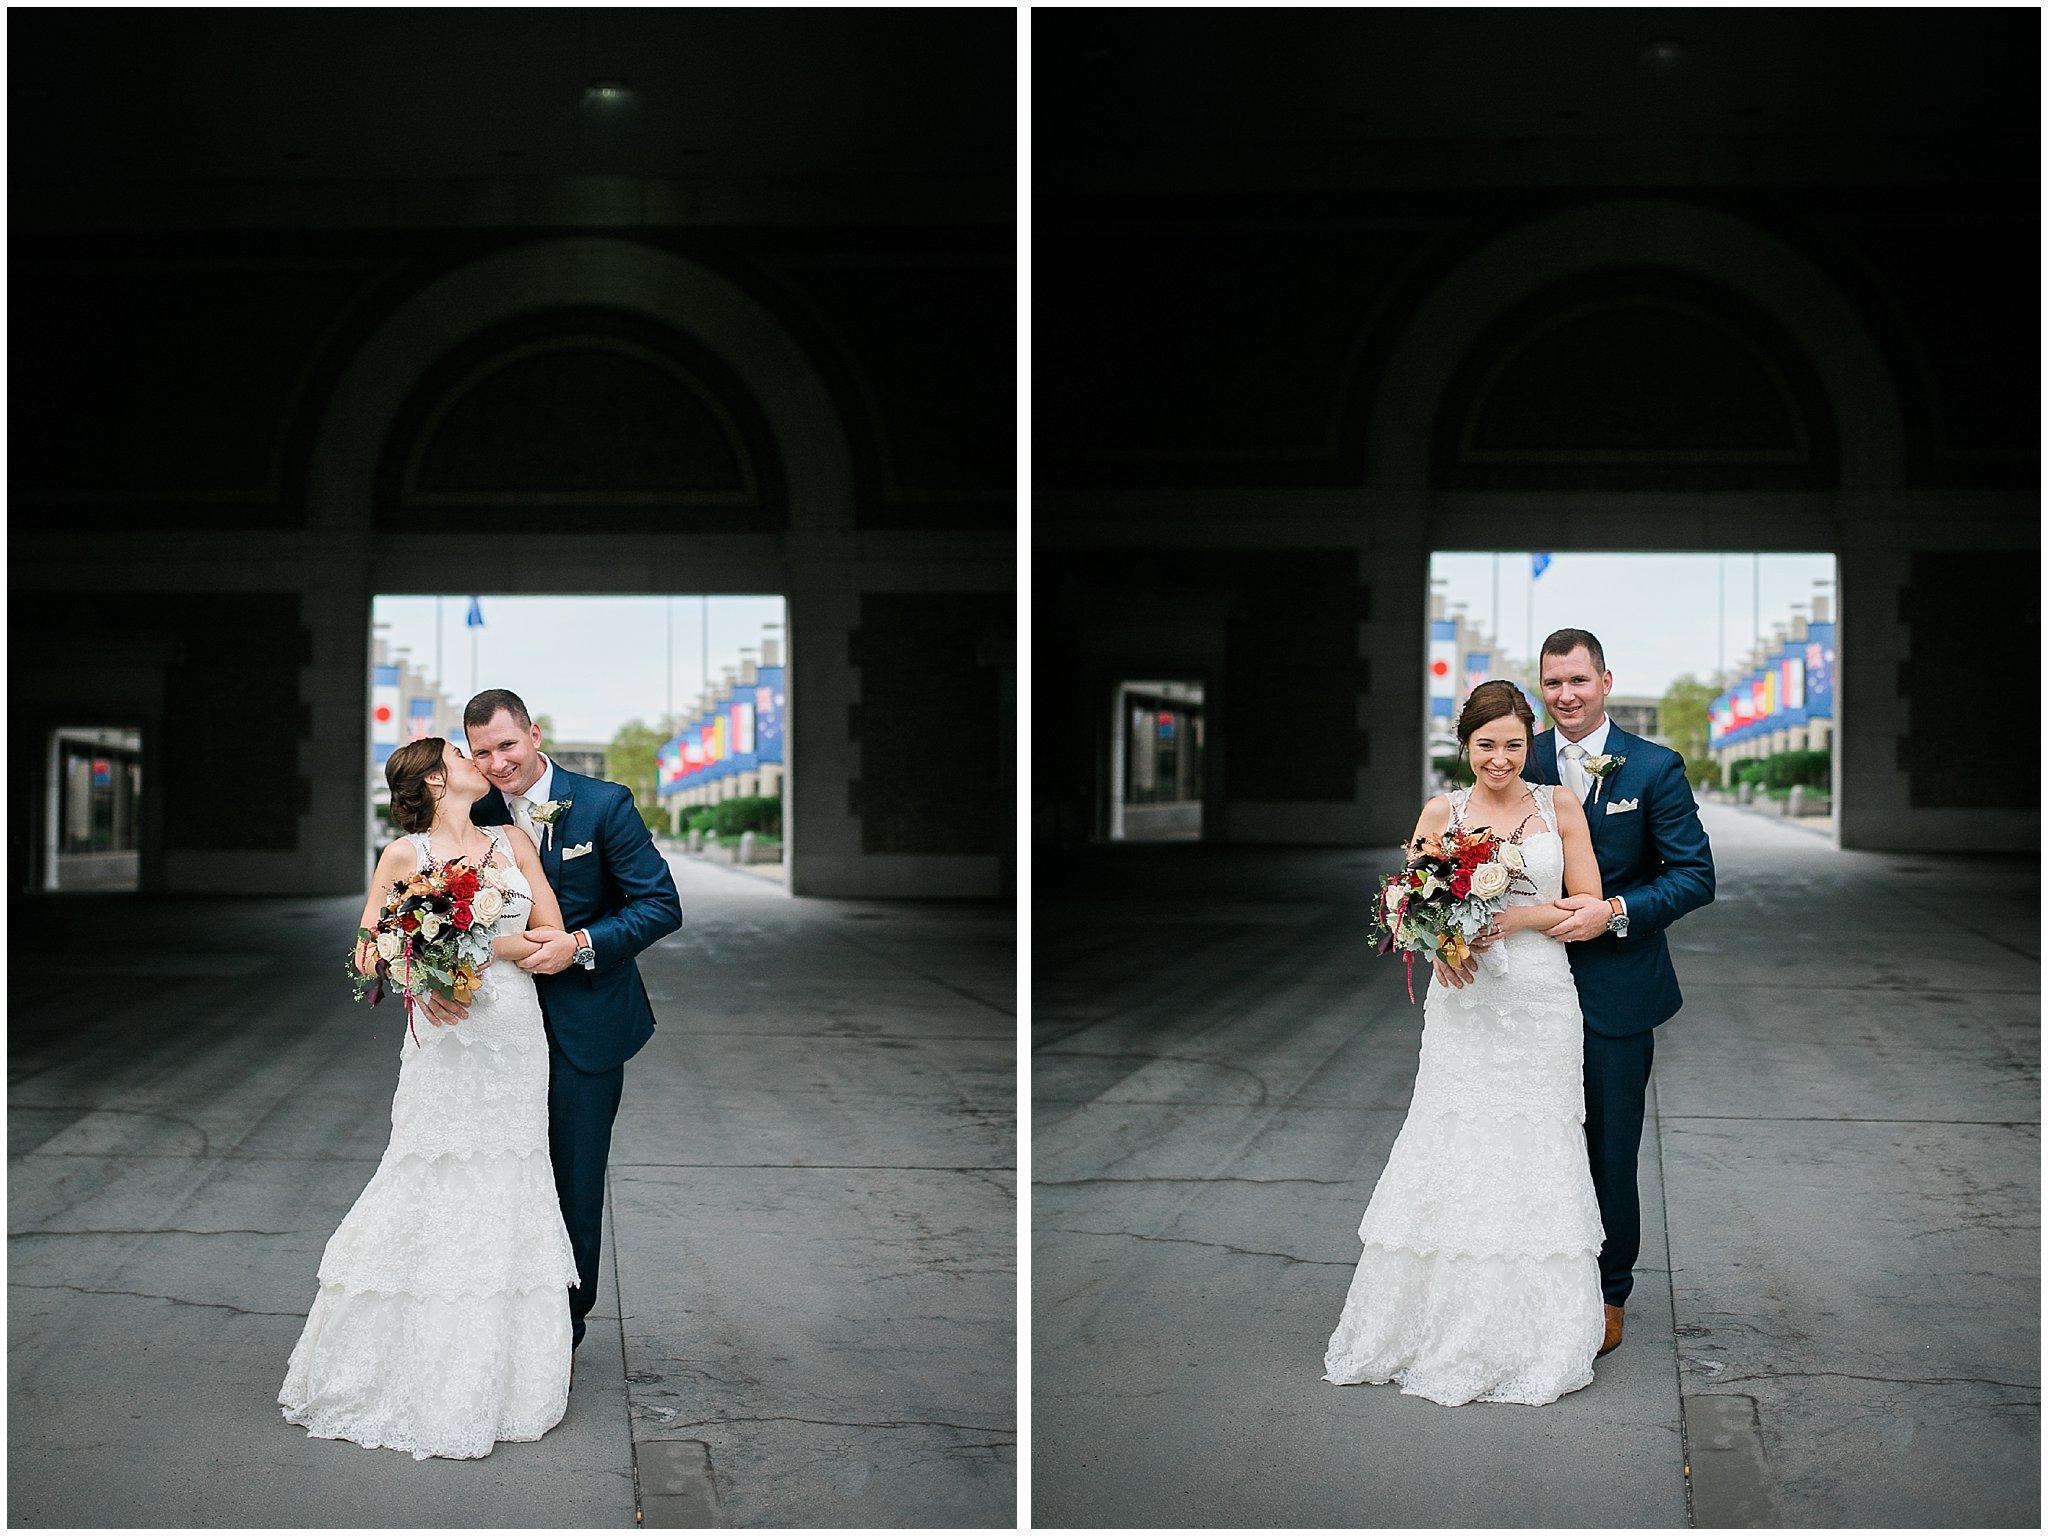 Seaport Hotel Wedding Boston Photographer Sweet Alice58.jpg